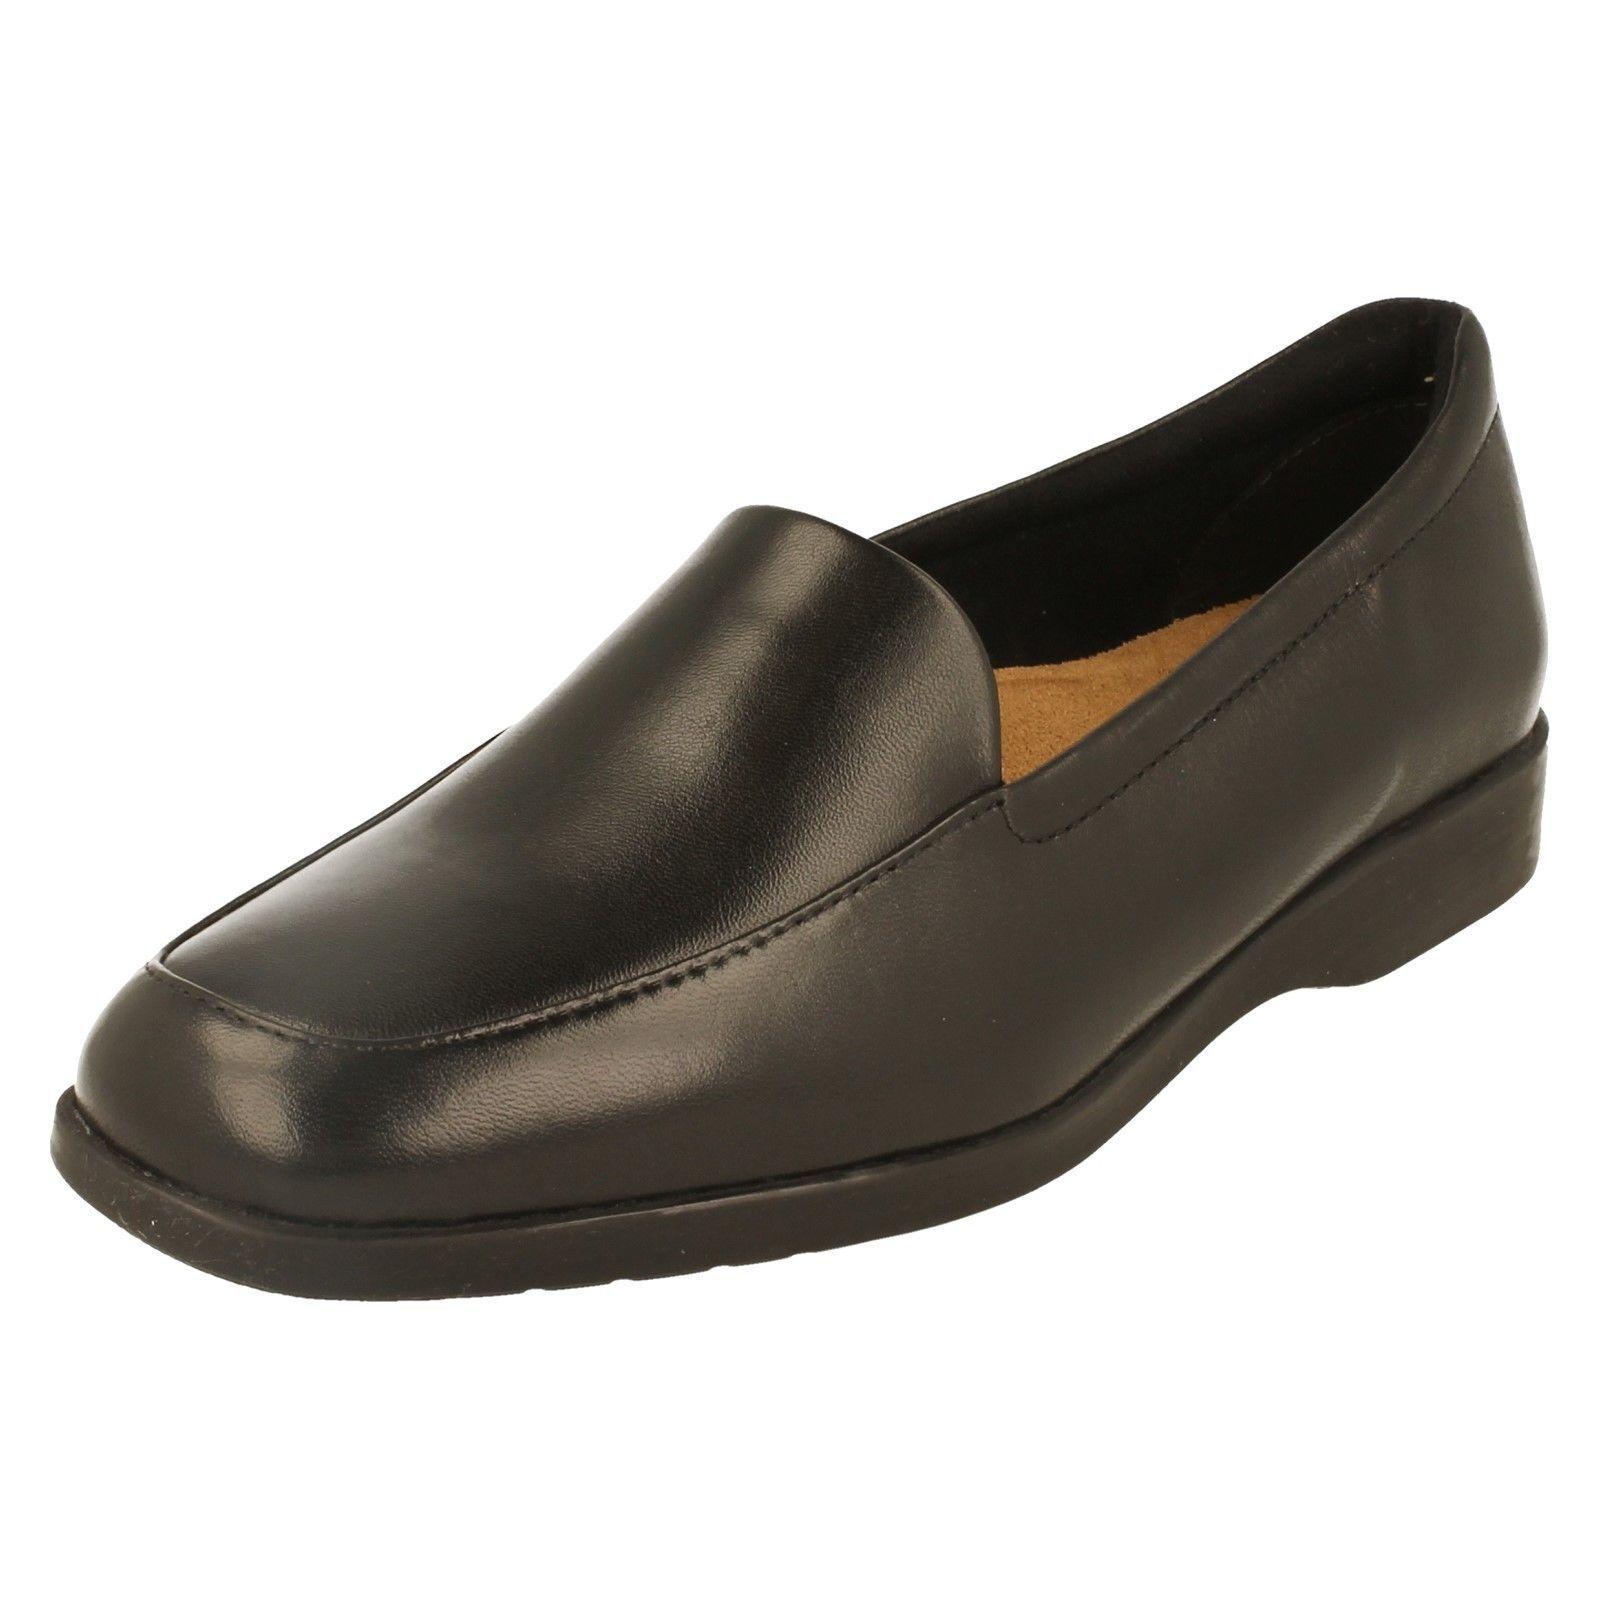 K by Clarks Georgia weite Damen schwarz Leder Schuhe weite Georgia Passform d20892